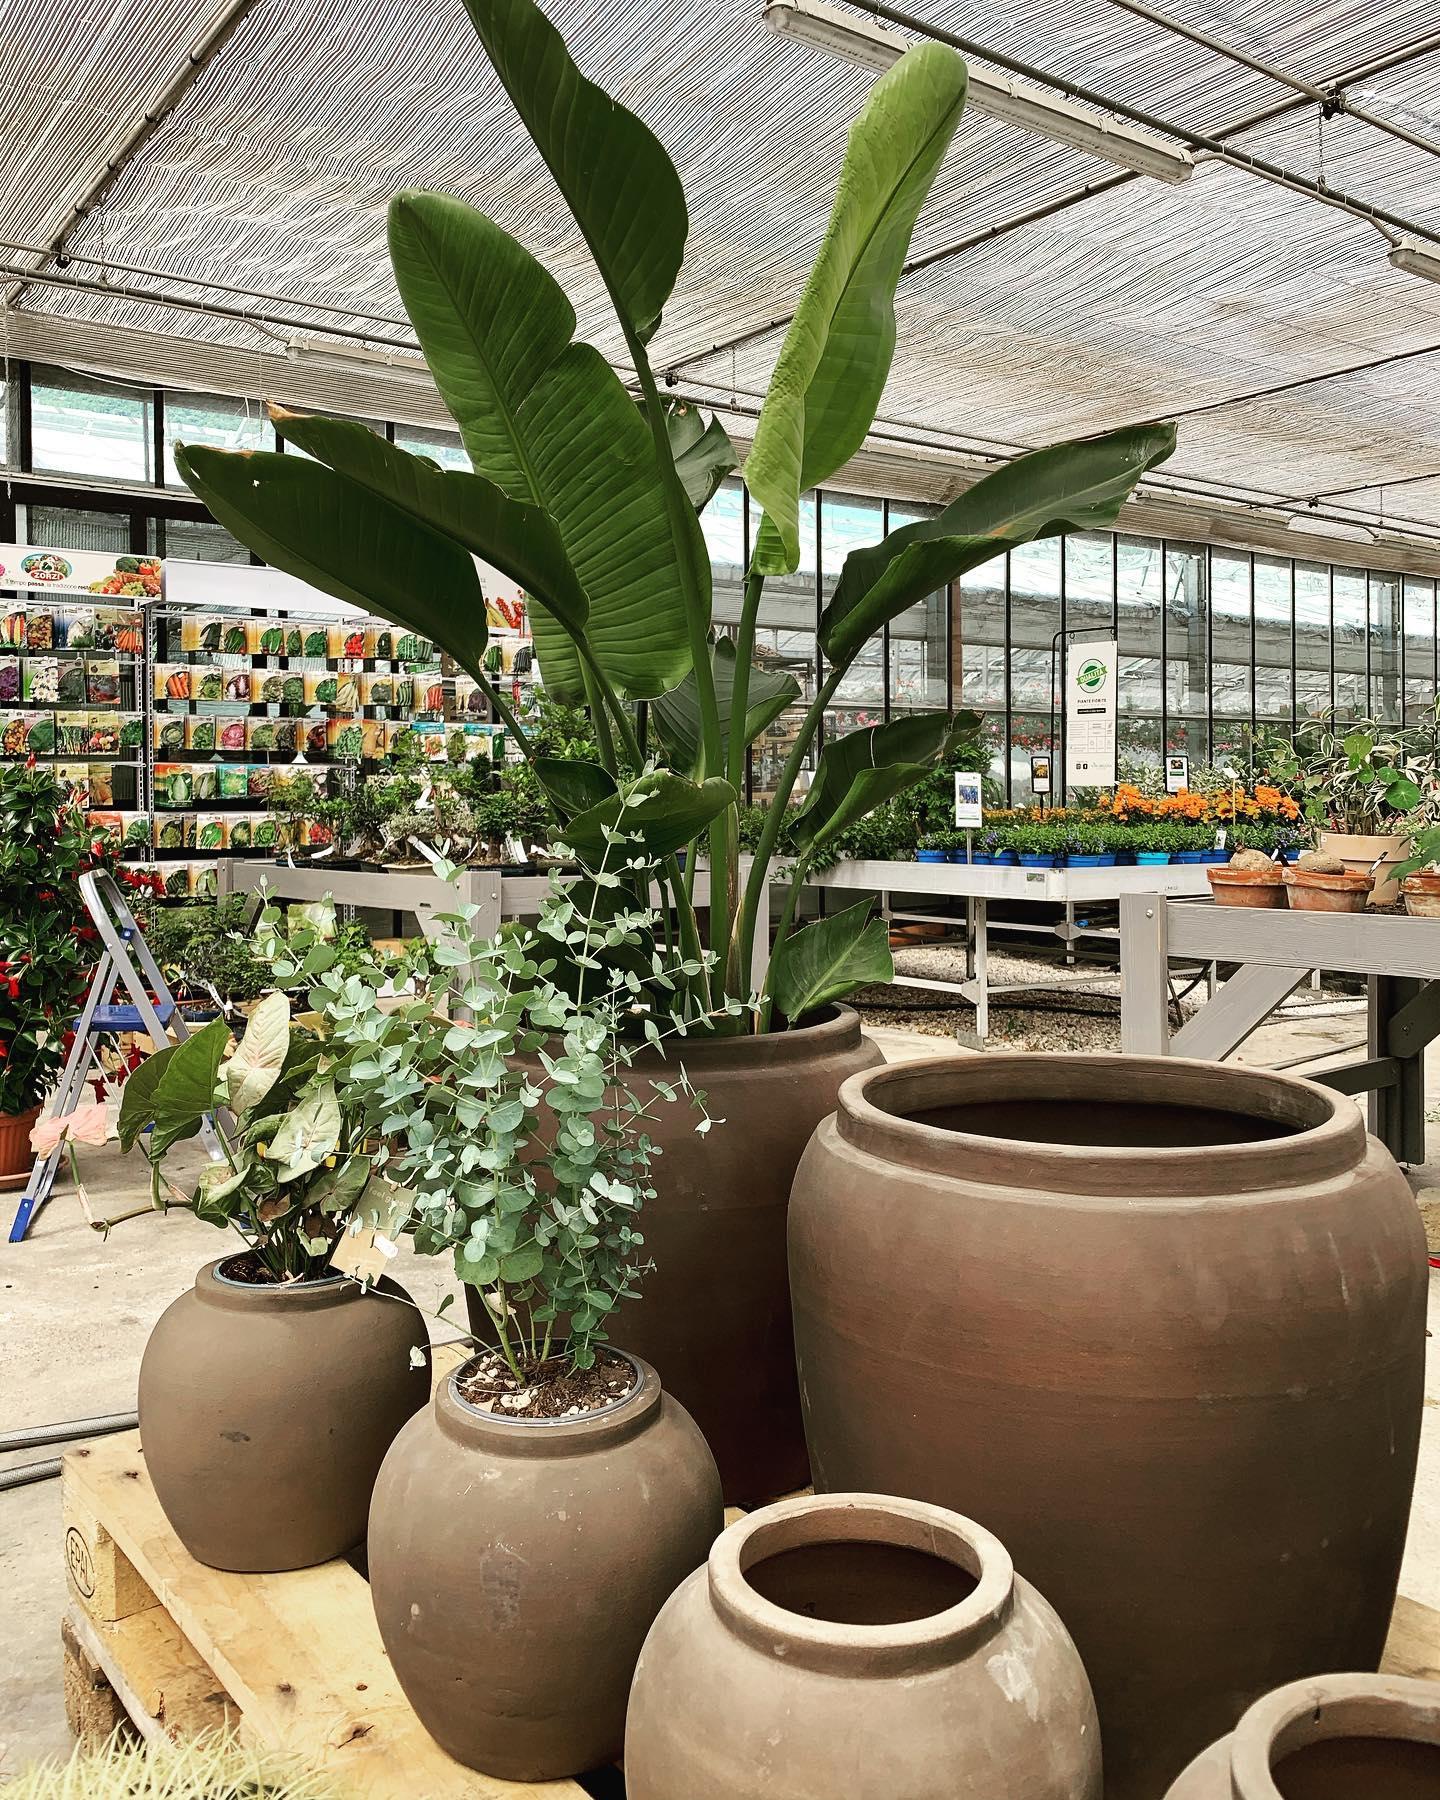 Vasi e piante acquistabili presso i Vivai Brugna